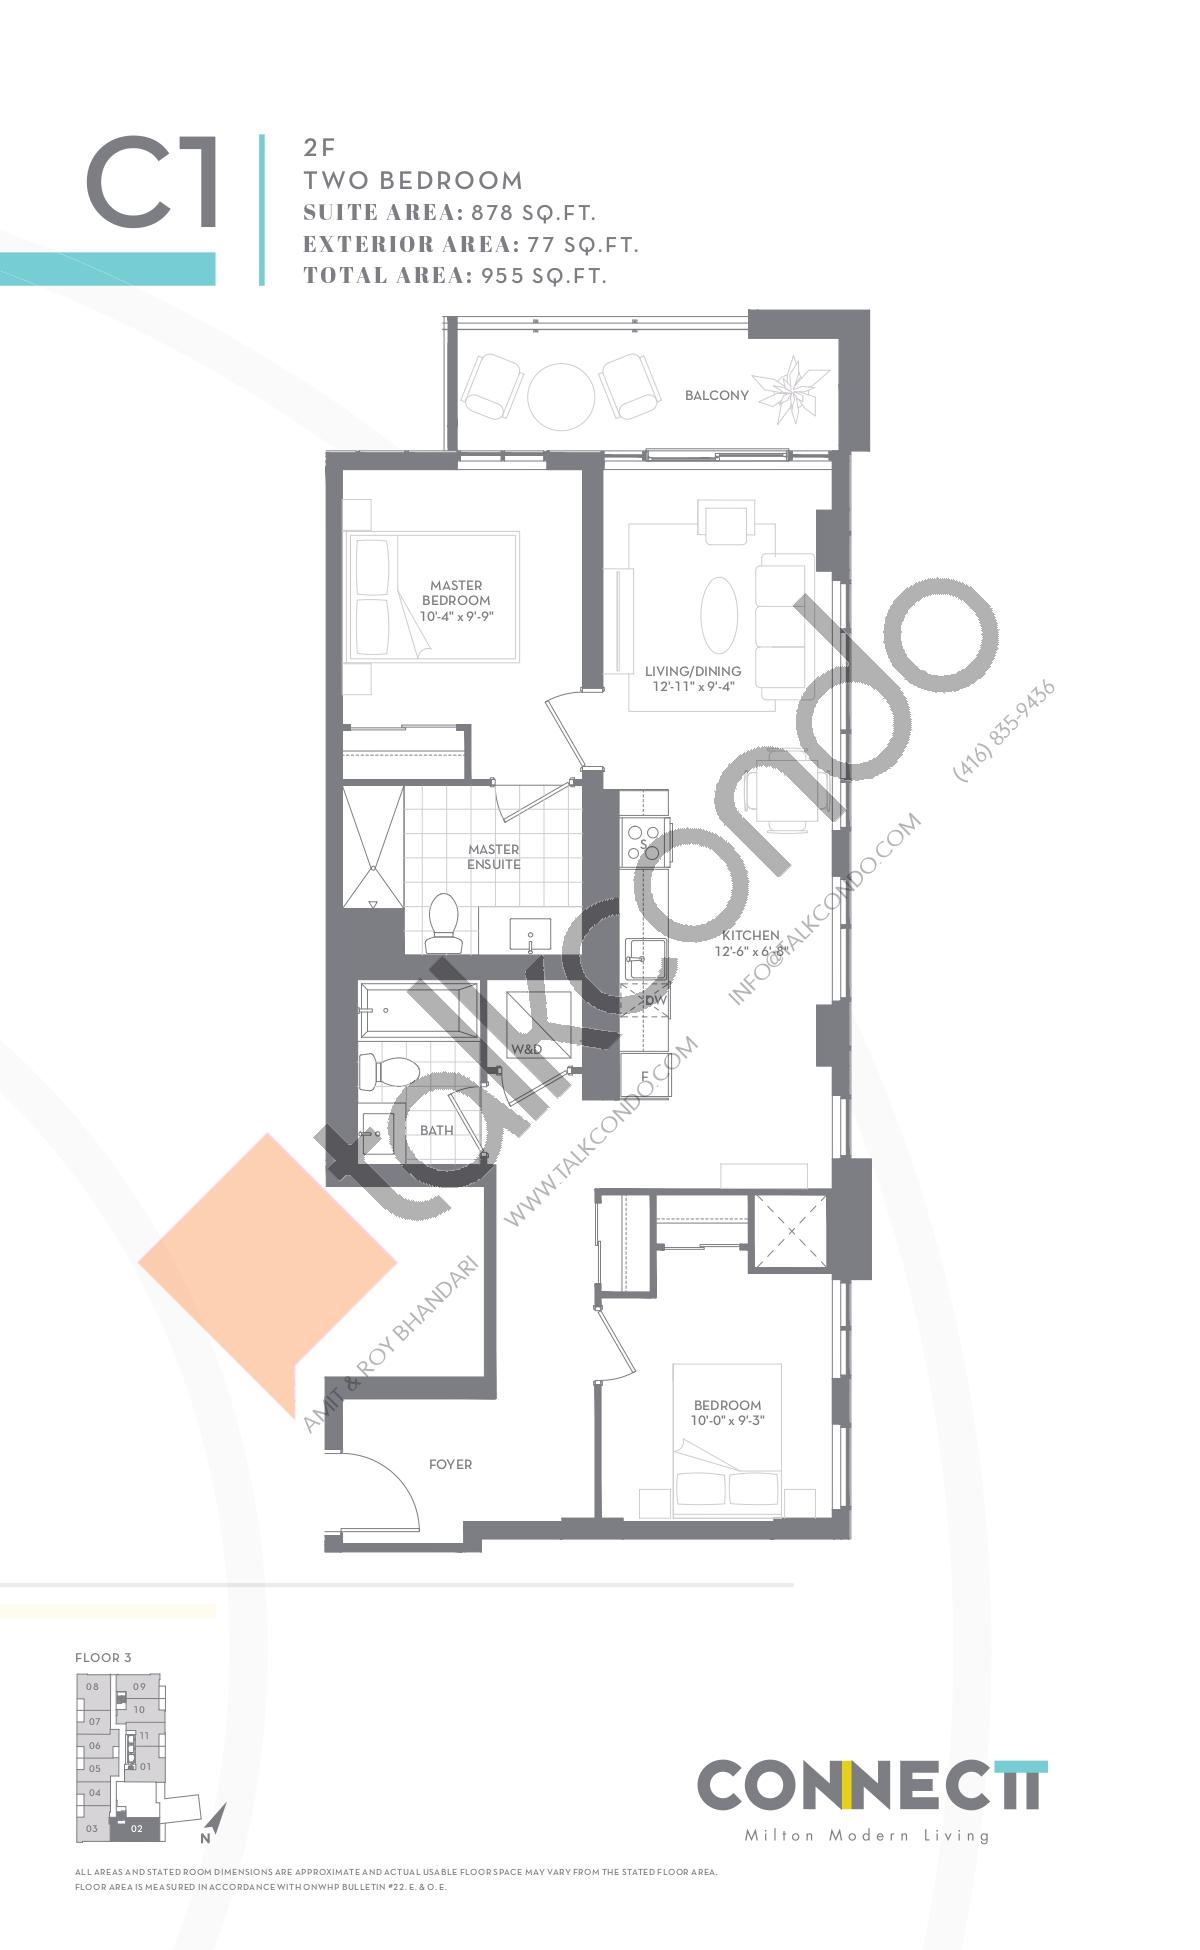 2F Floor Plan at Connectt Urban Community Condos - 878 sq.ft